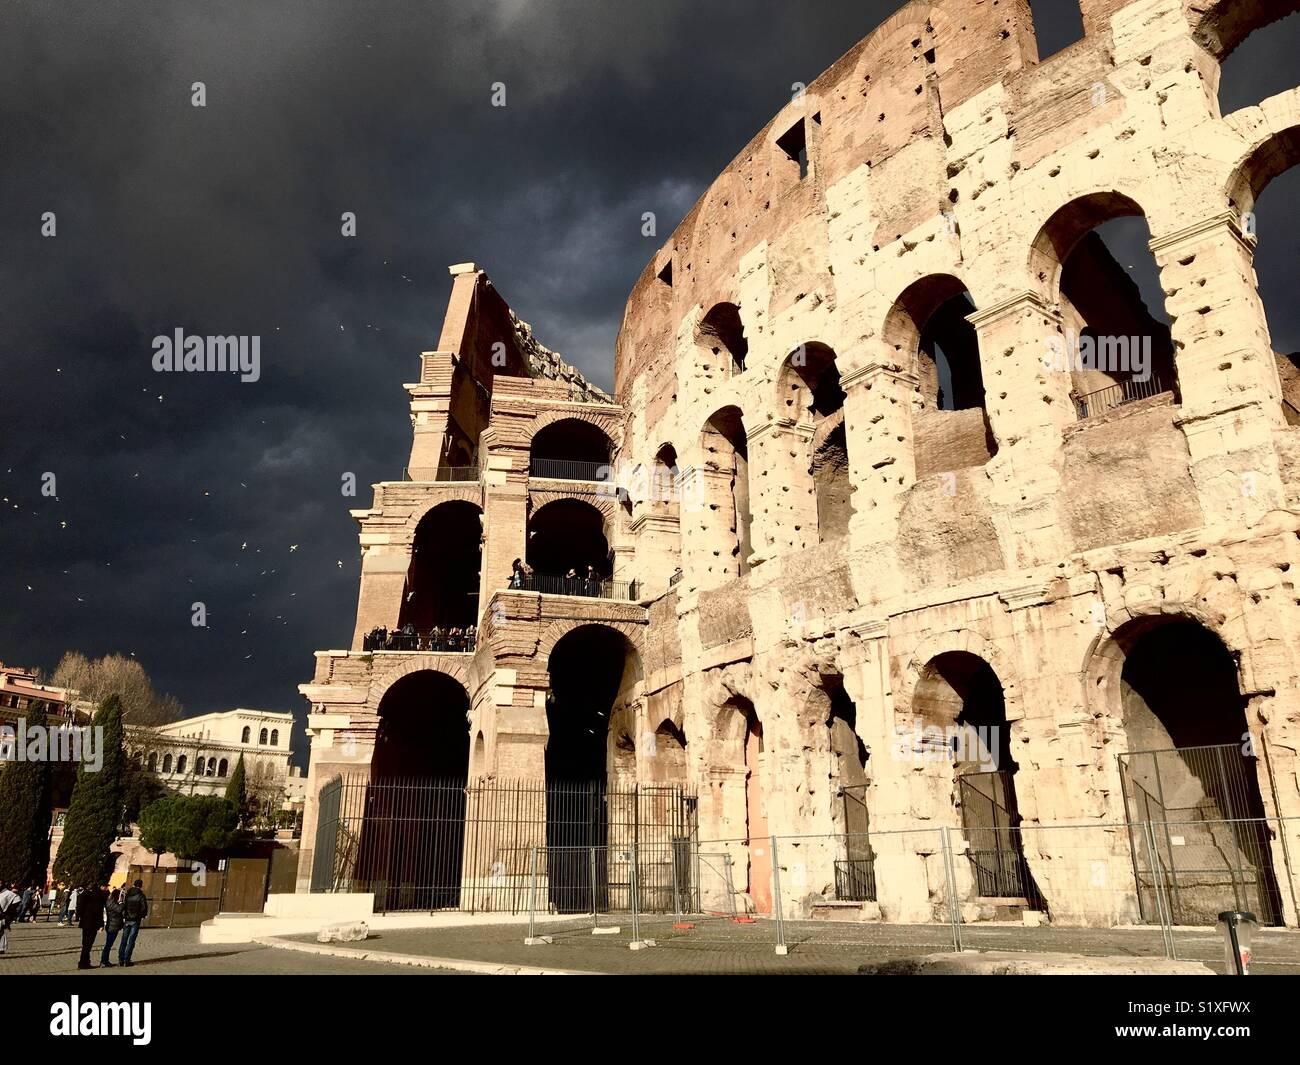 Dark Rome Sky Stock Photos & Dark Rome Sky Stock Images - Alamy